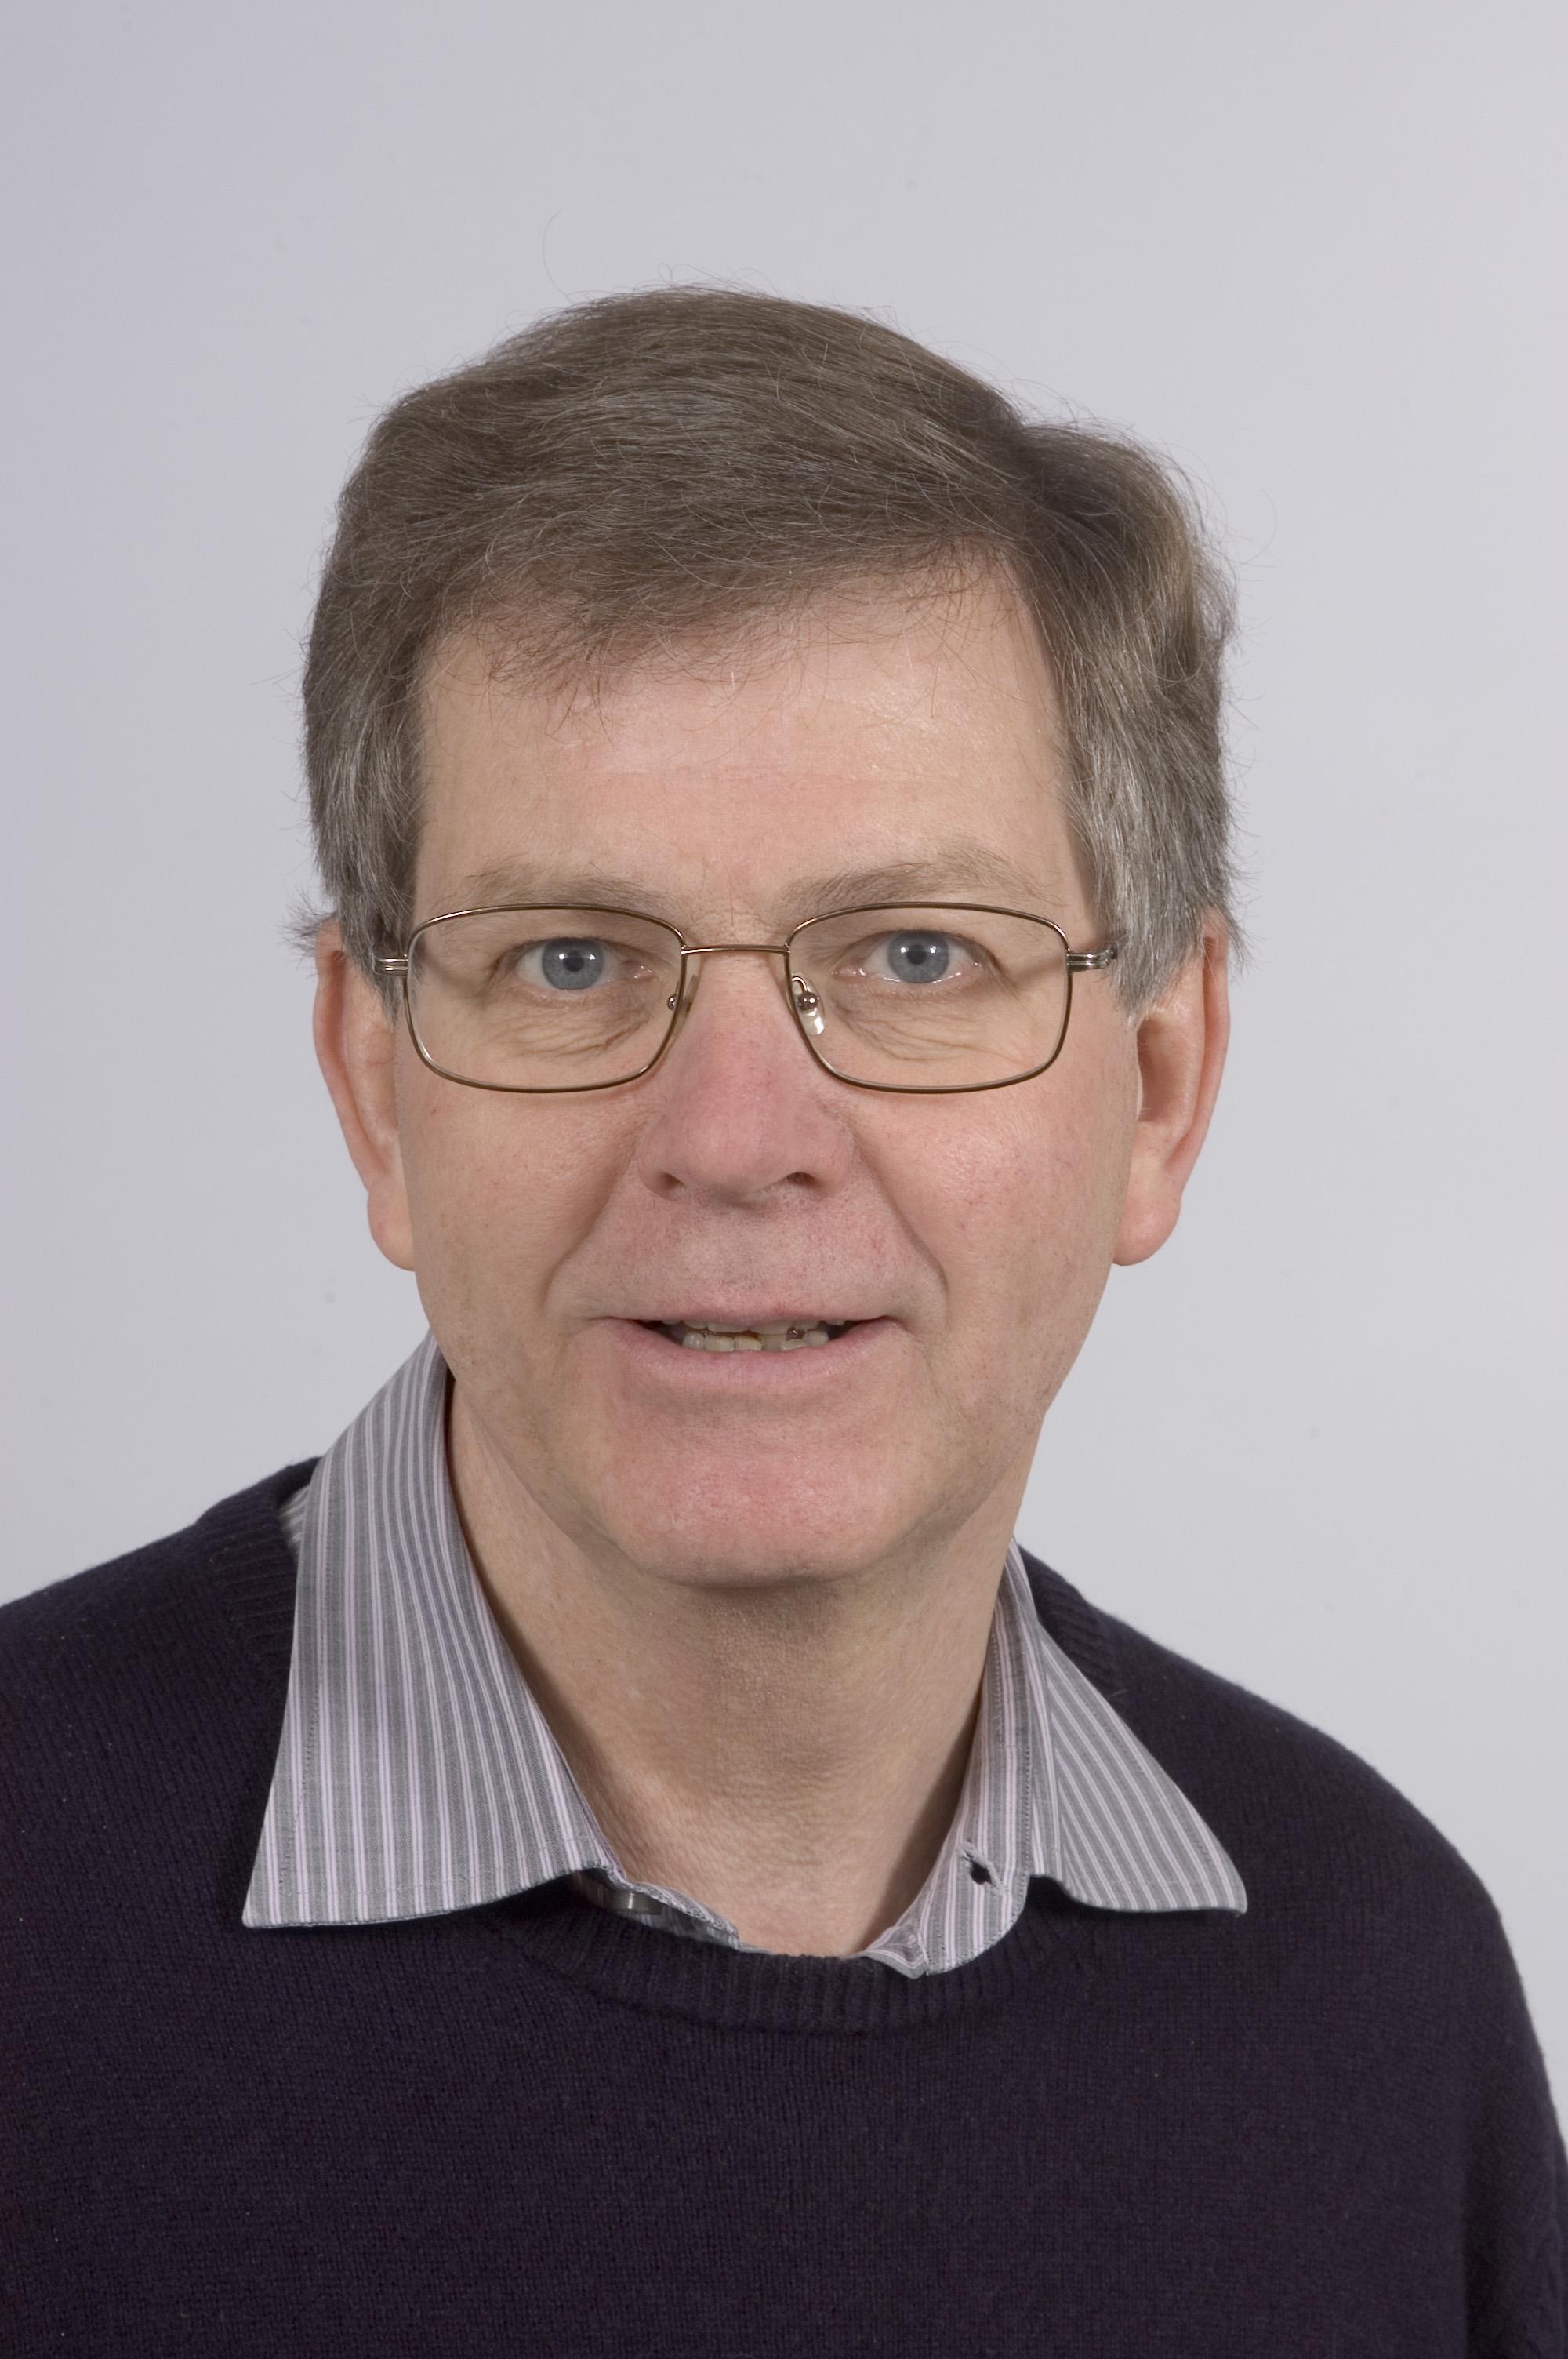 Neil Hirst